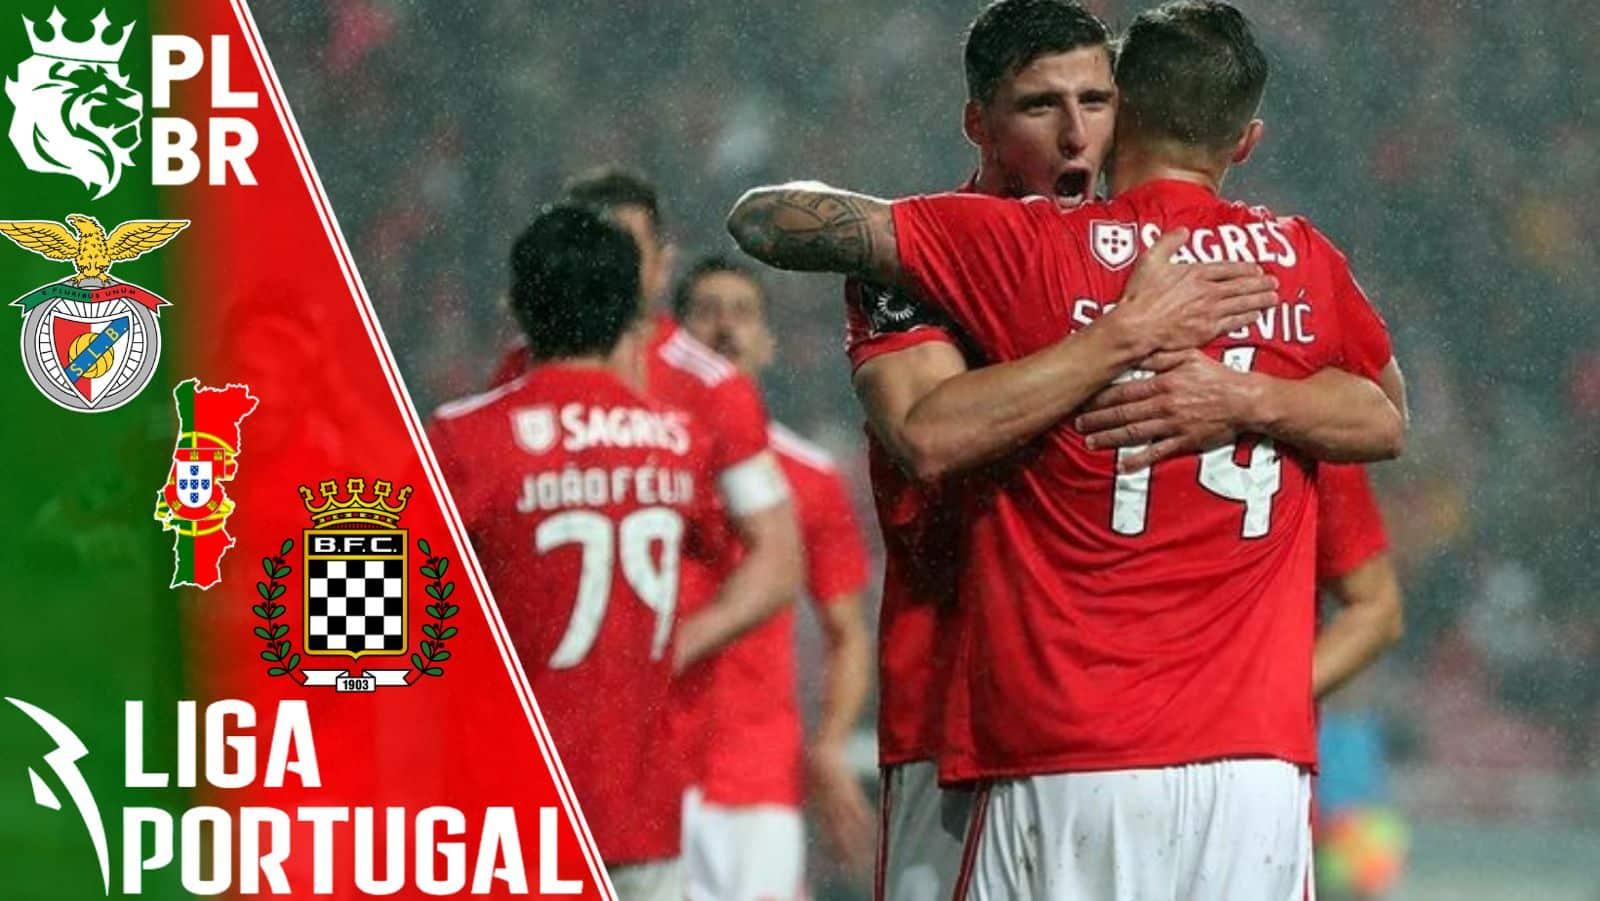 Benfica x Boavista - 20/09